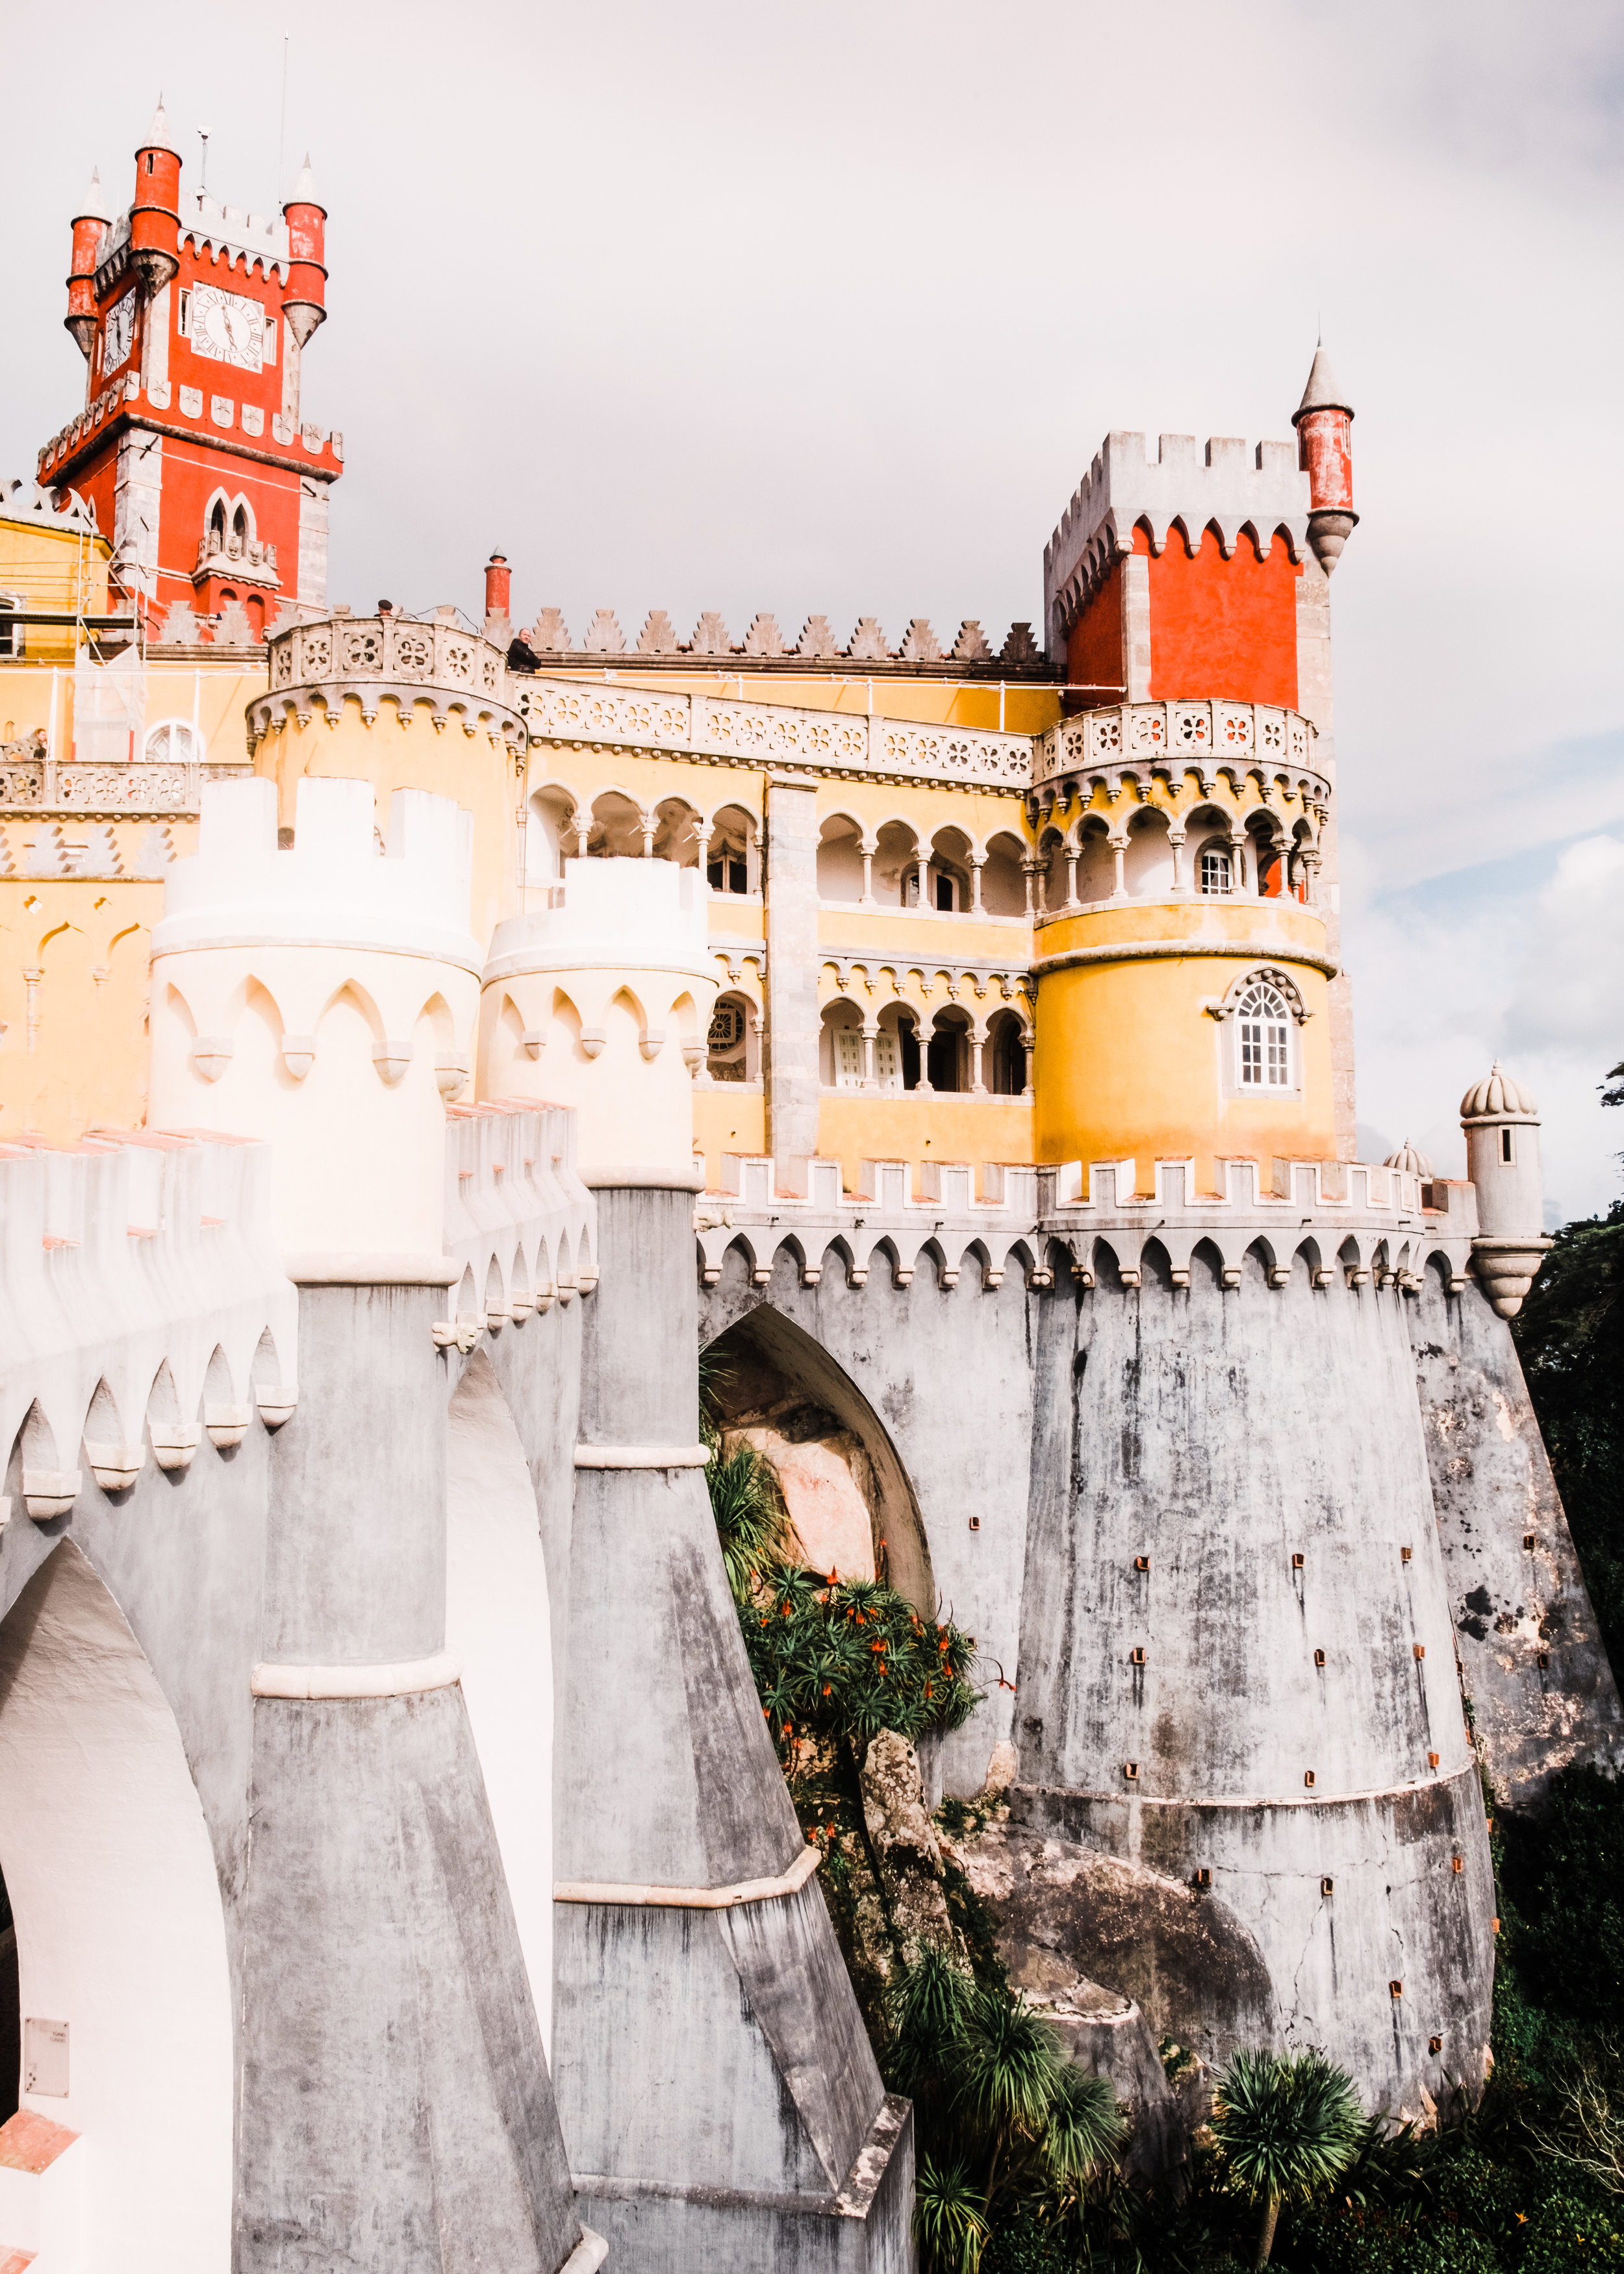 PenaPalace_Sintra_Portugal_JuliaMattis_Photo03.jpg